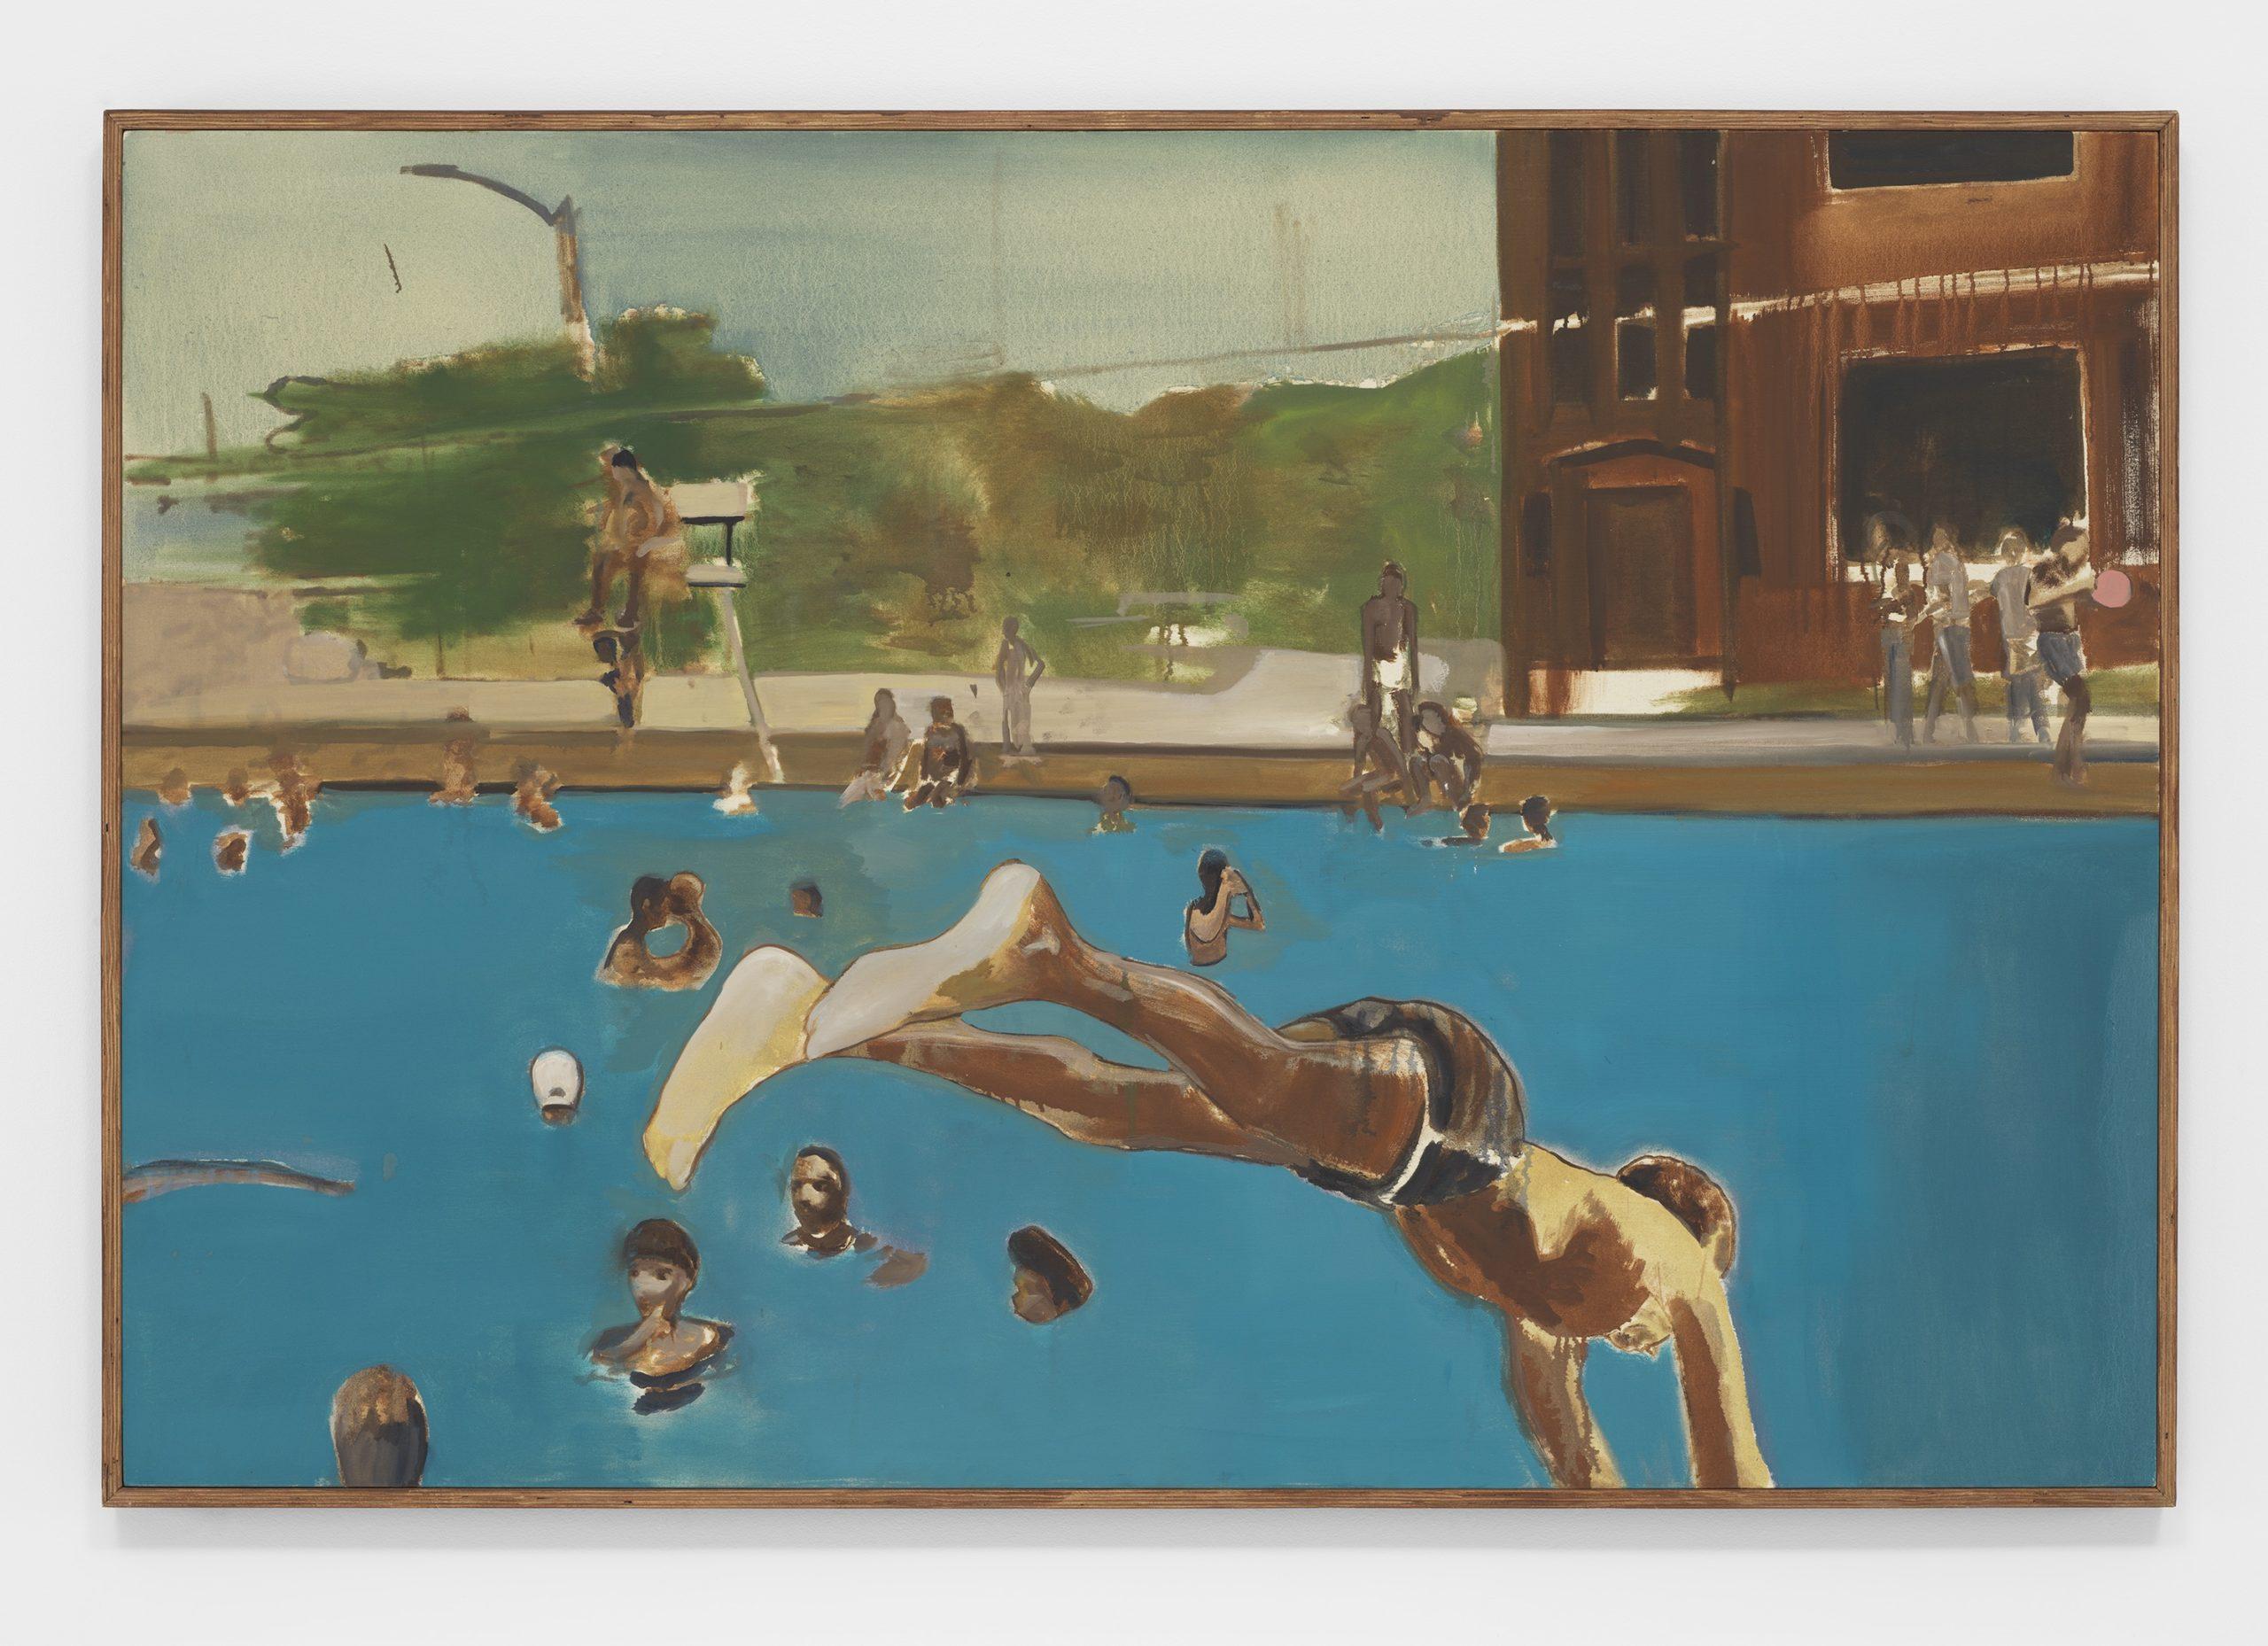 Noah Davis, 1975 (8), 2013, Private Collection of Martin H. Nesbitt and Dr. Anita Blanchard © The Estate of Noah Davis